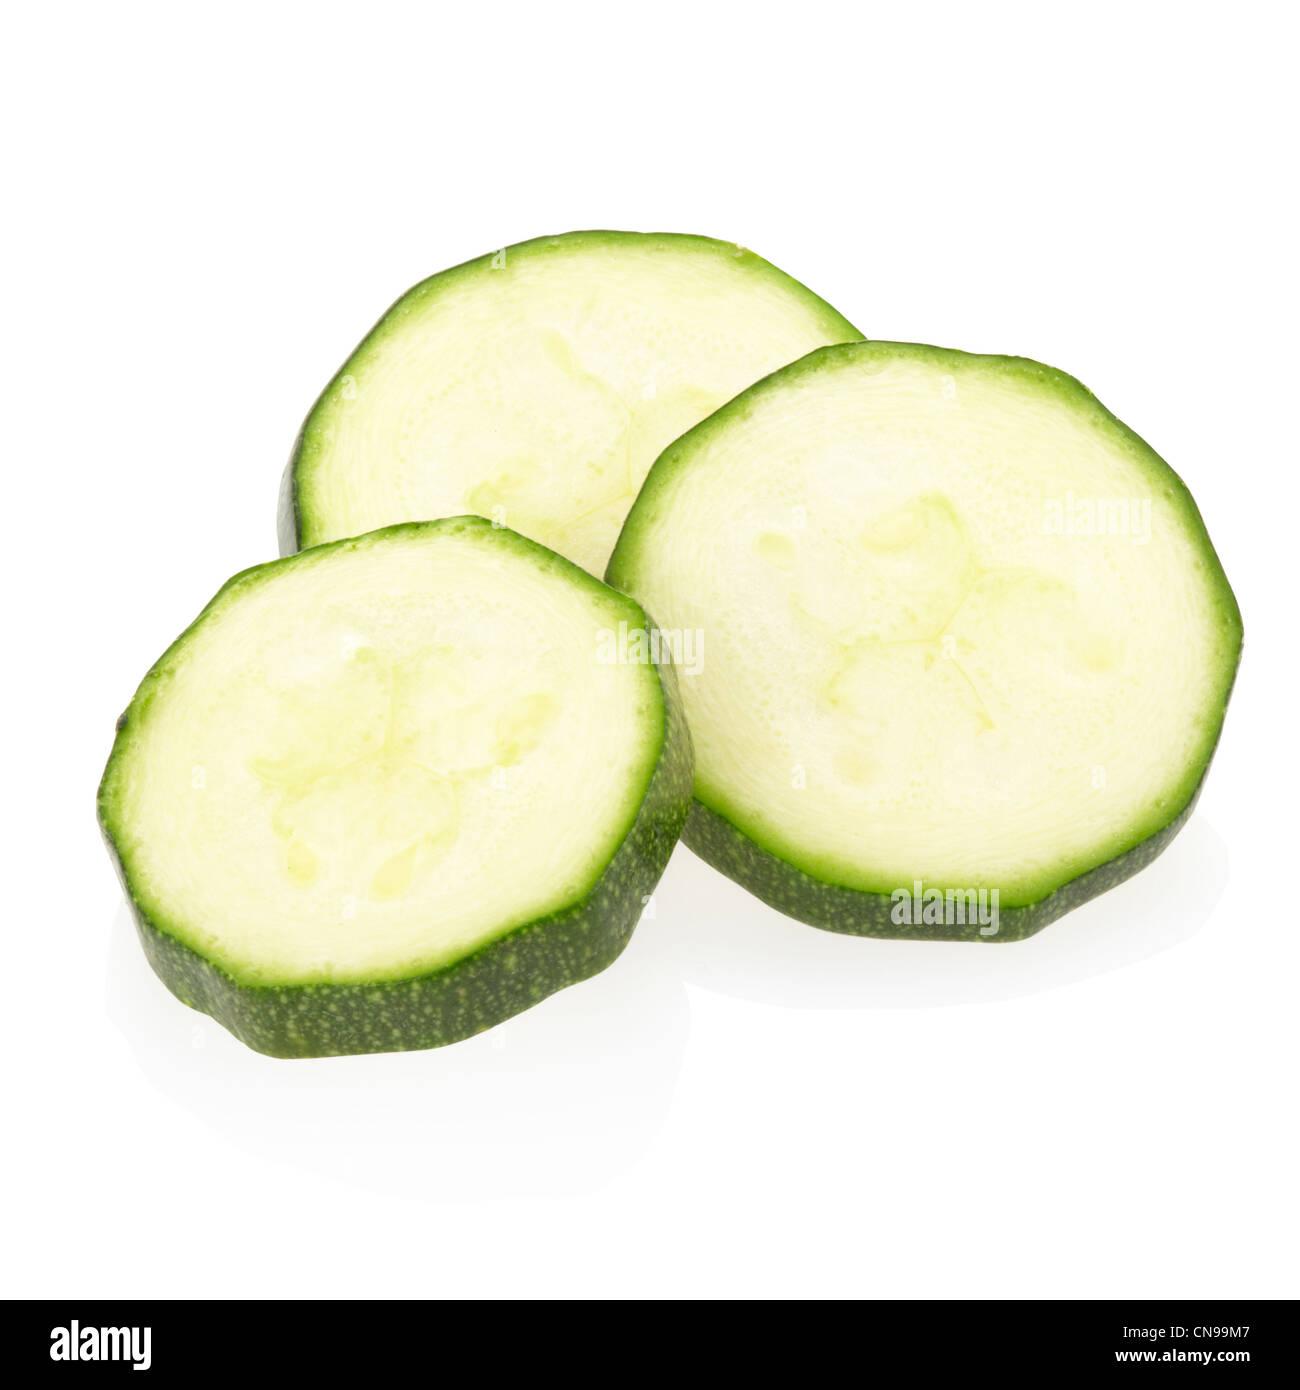 Zucchini slices Stock Photo: 47533703 - Alamy